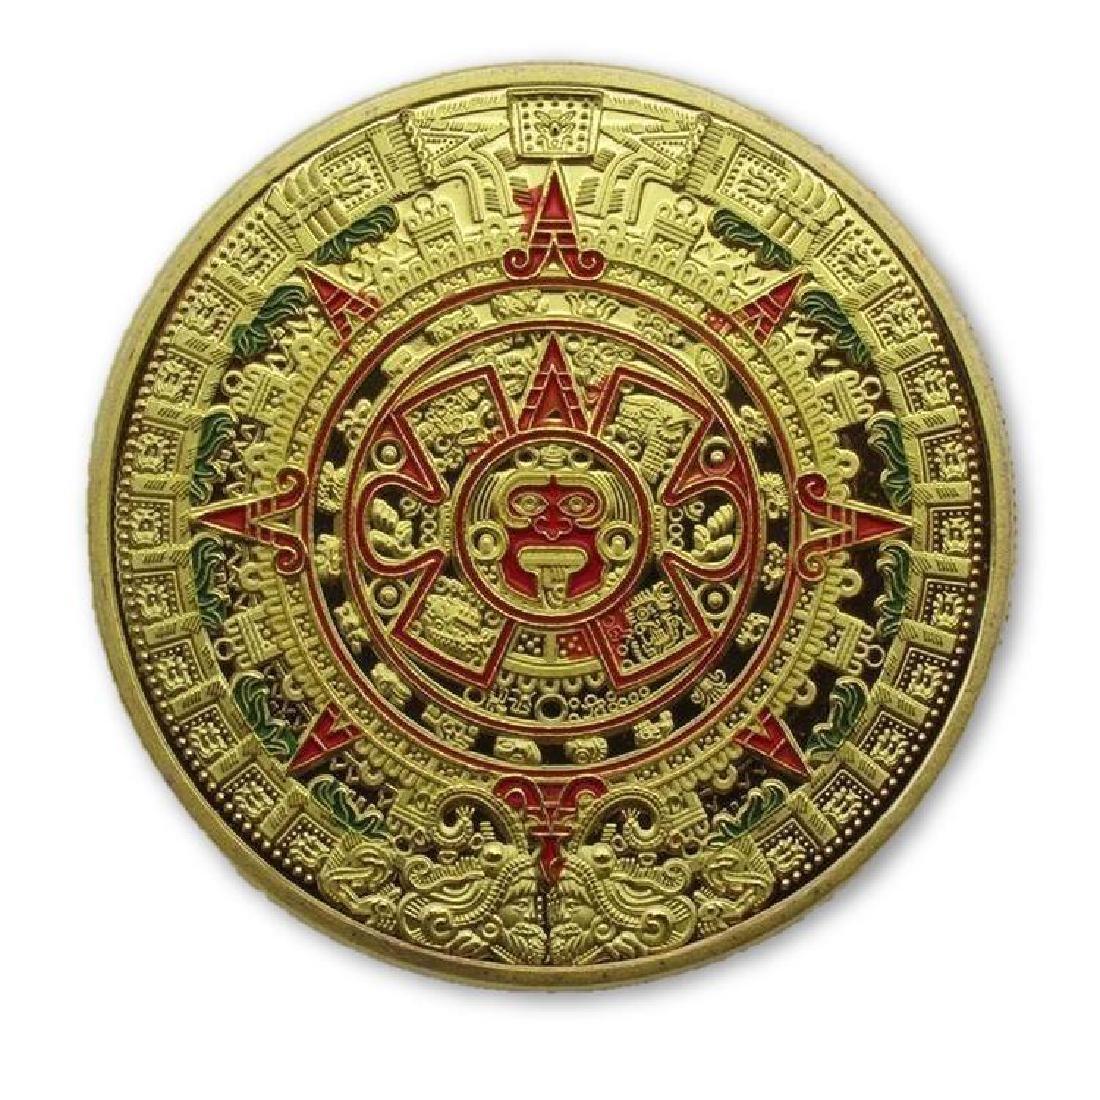 Aztec Calendar Colored Gold Clad Coin